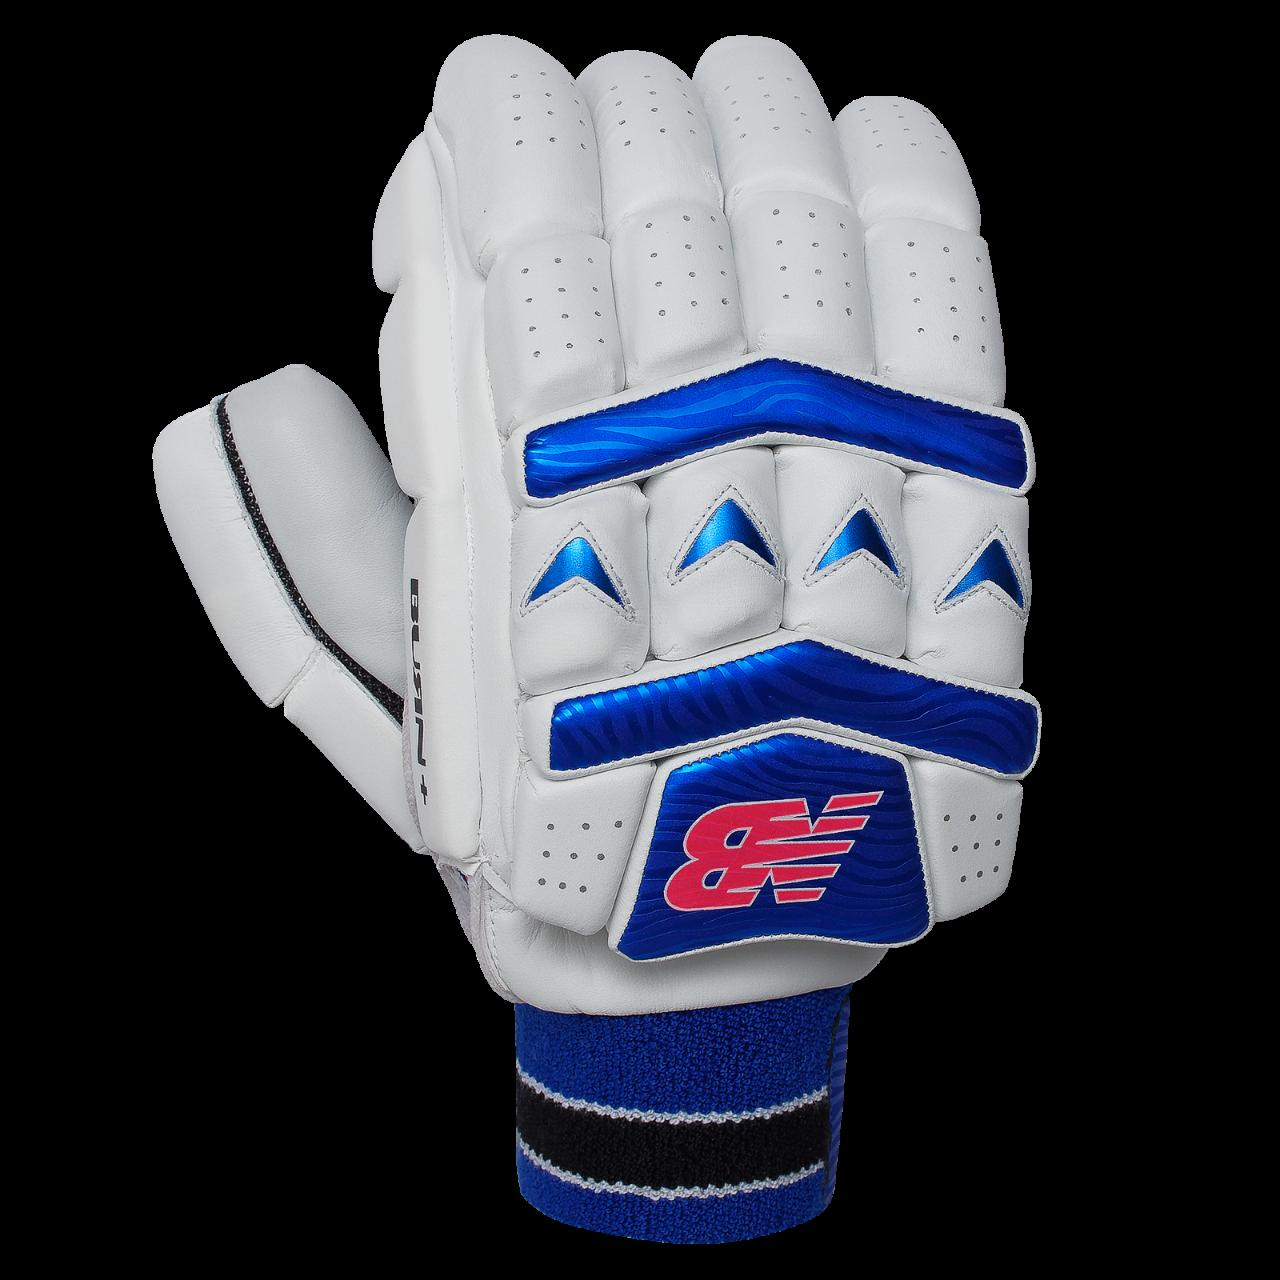 2021 New Balance Burn Junior Batting Gloves